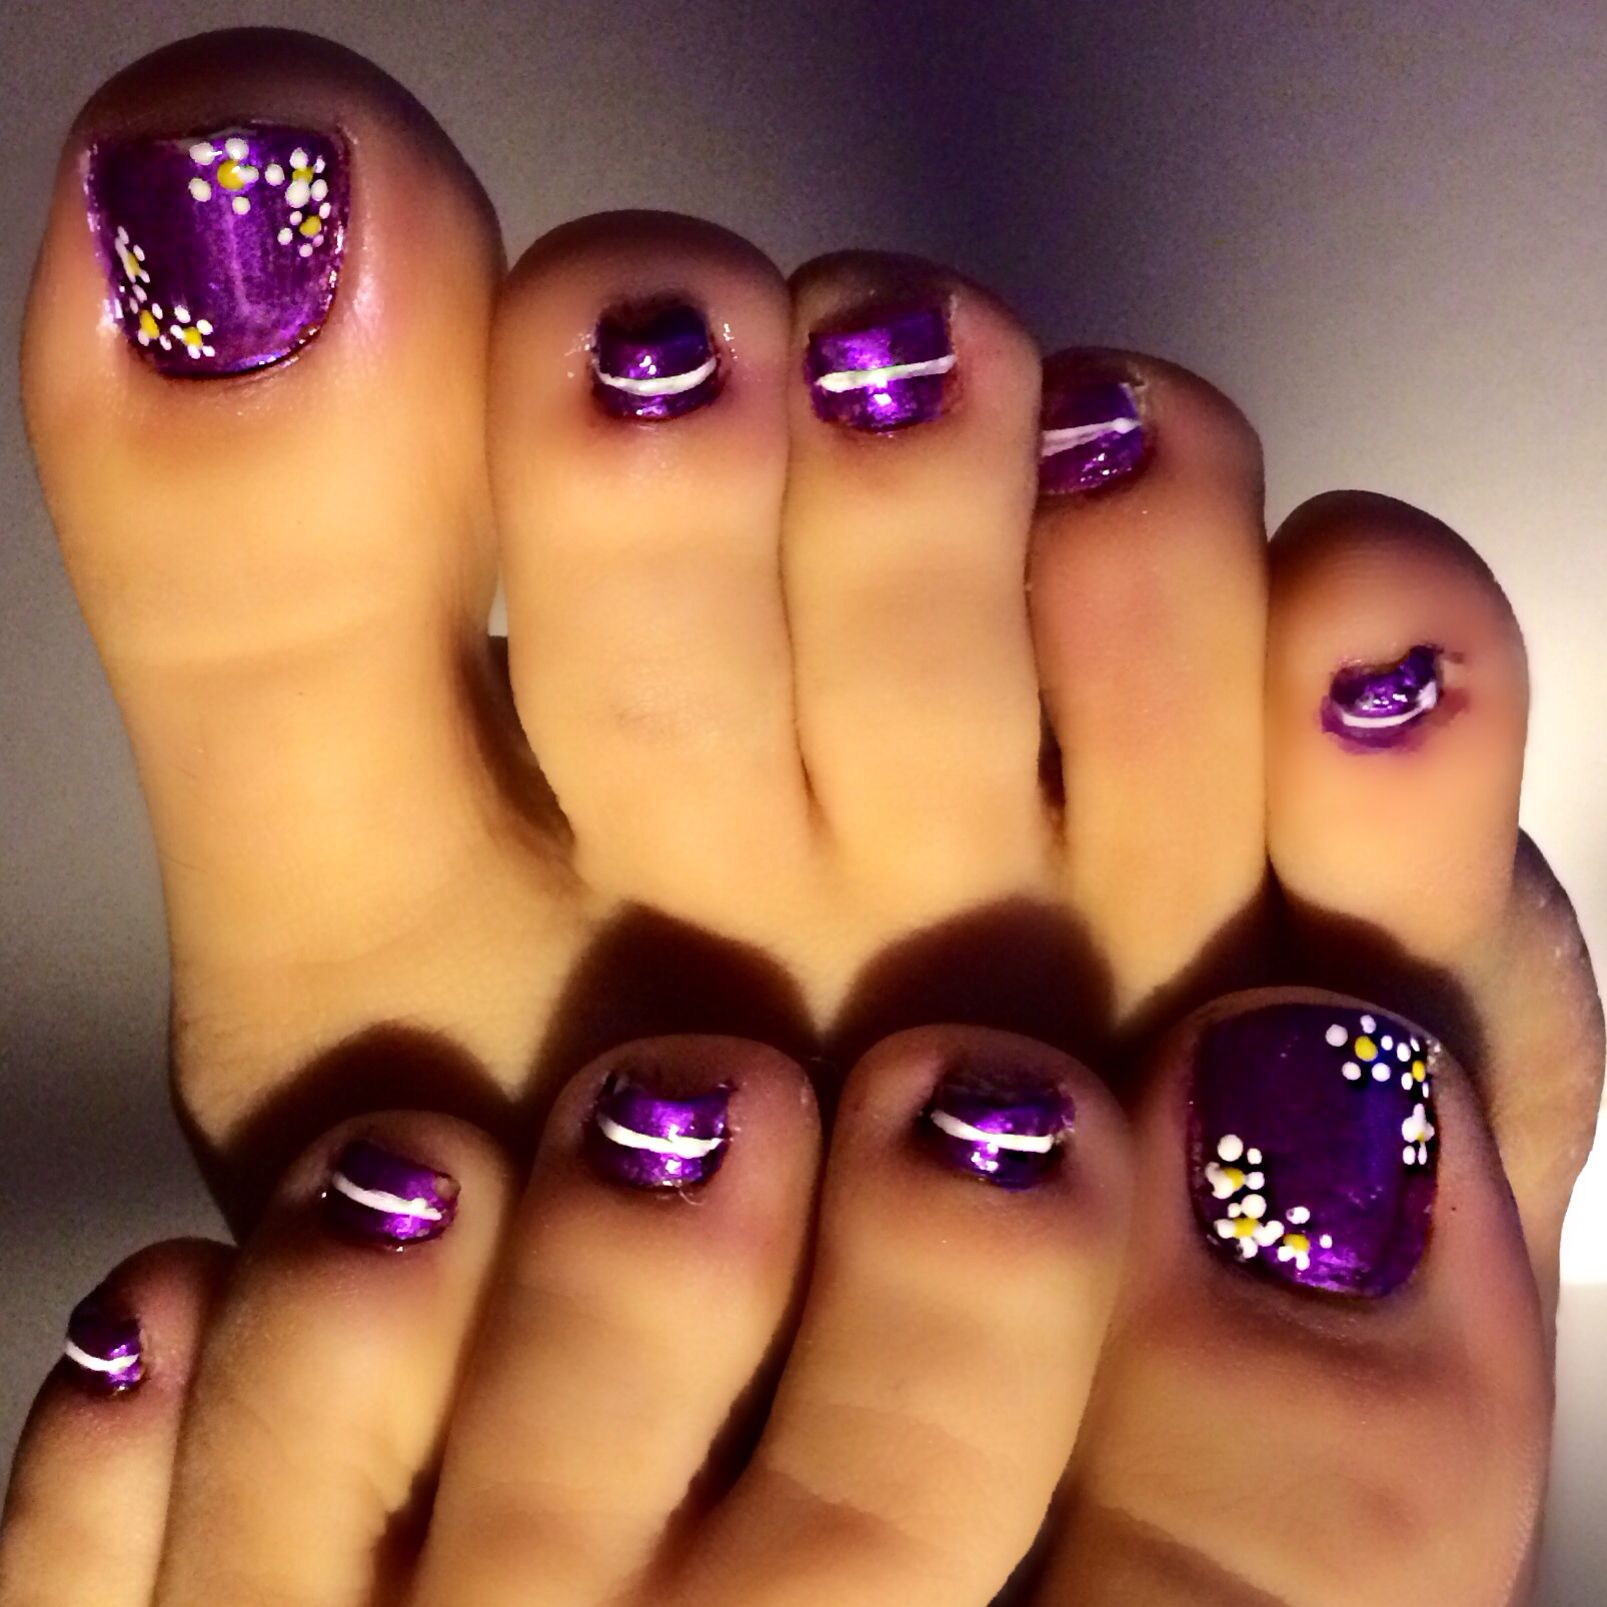 diy pedicure. flower toenails